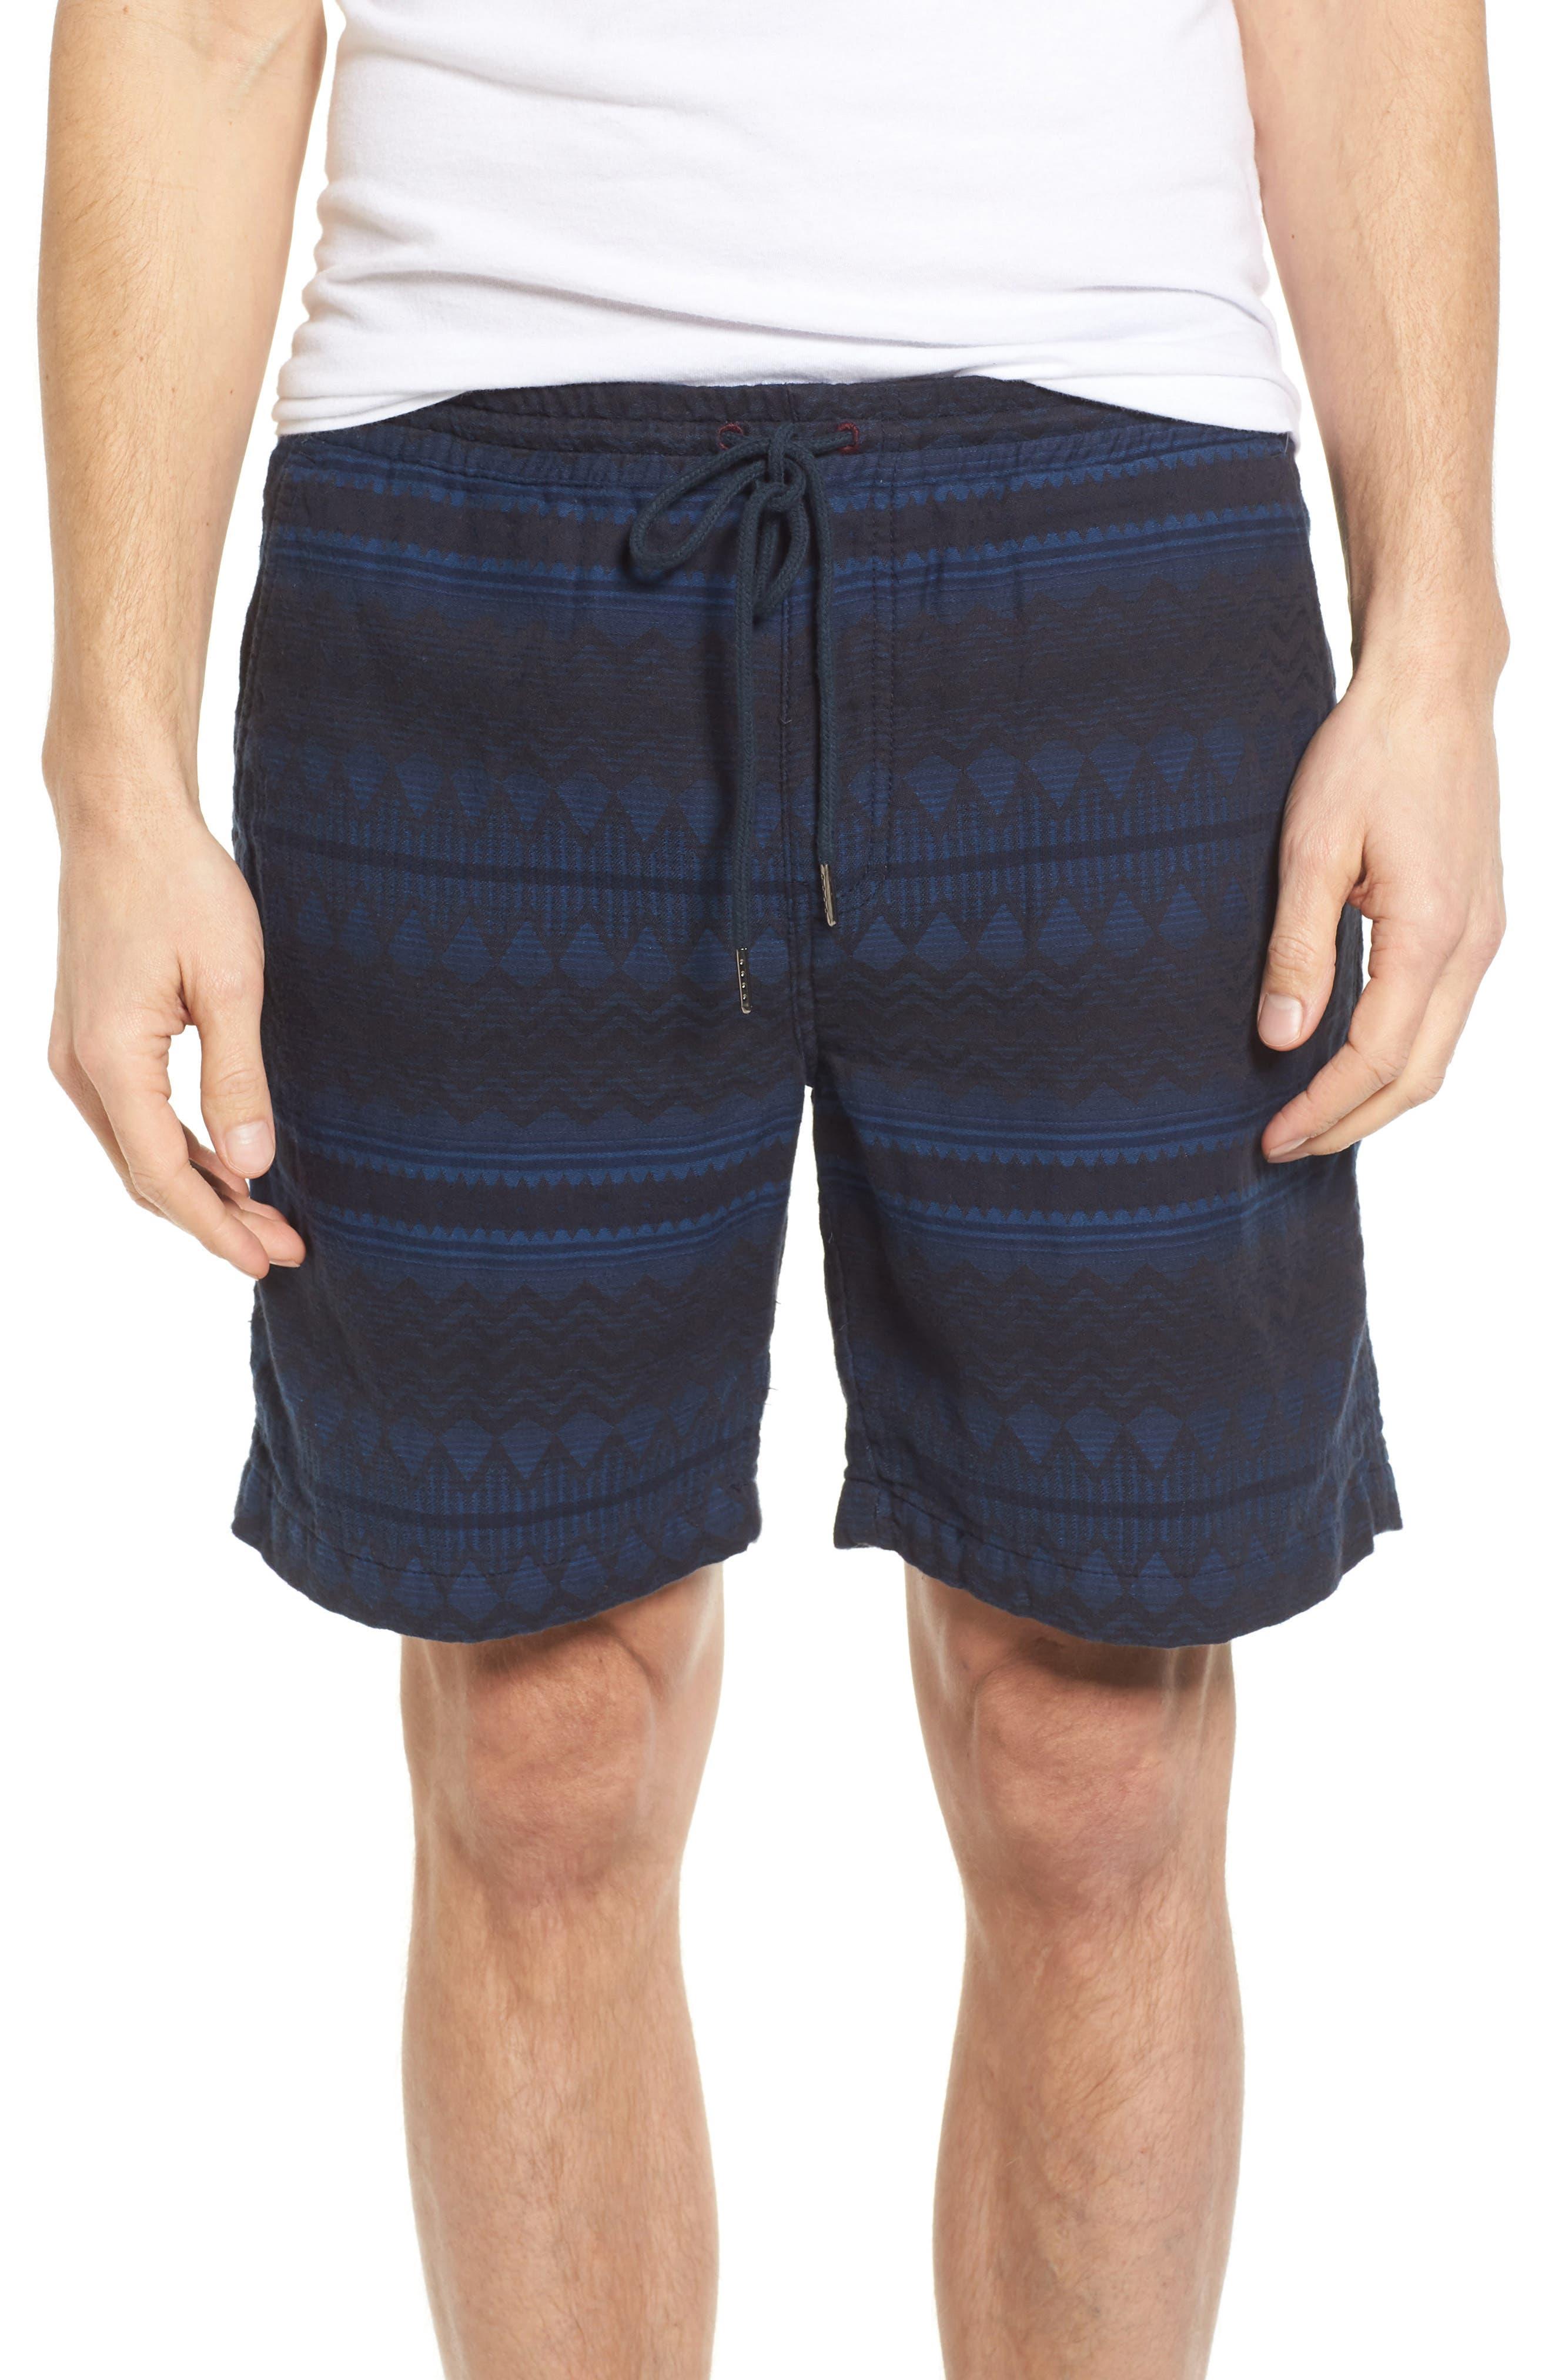 Nifty Genius Steve Print Pull-On Shorts